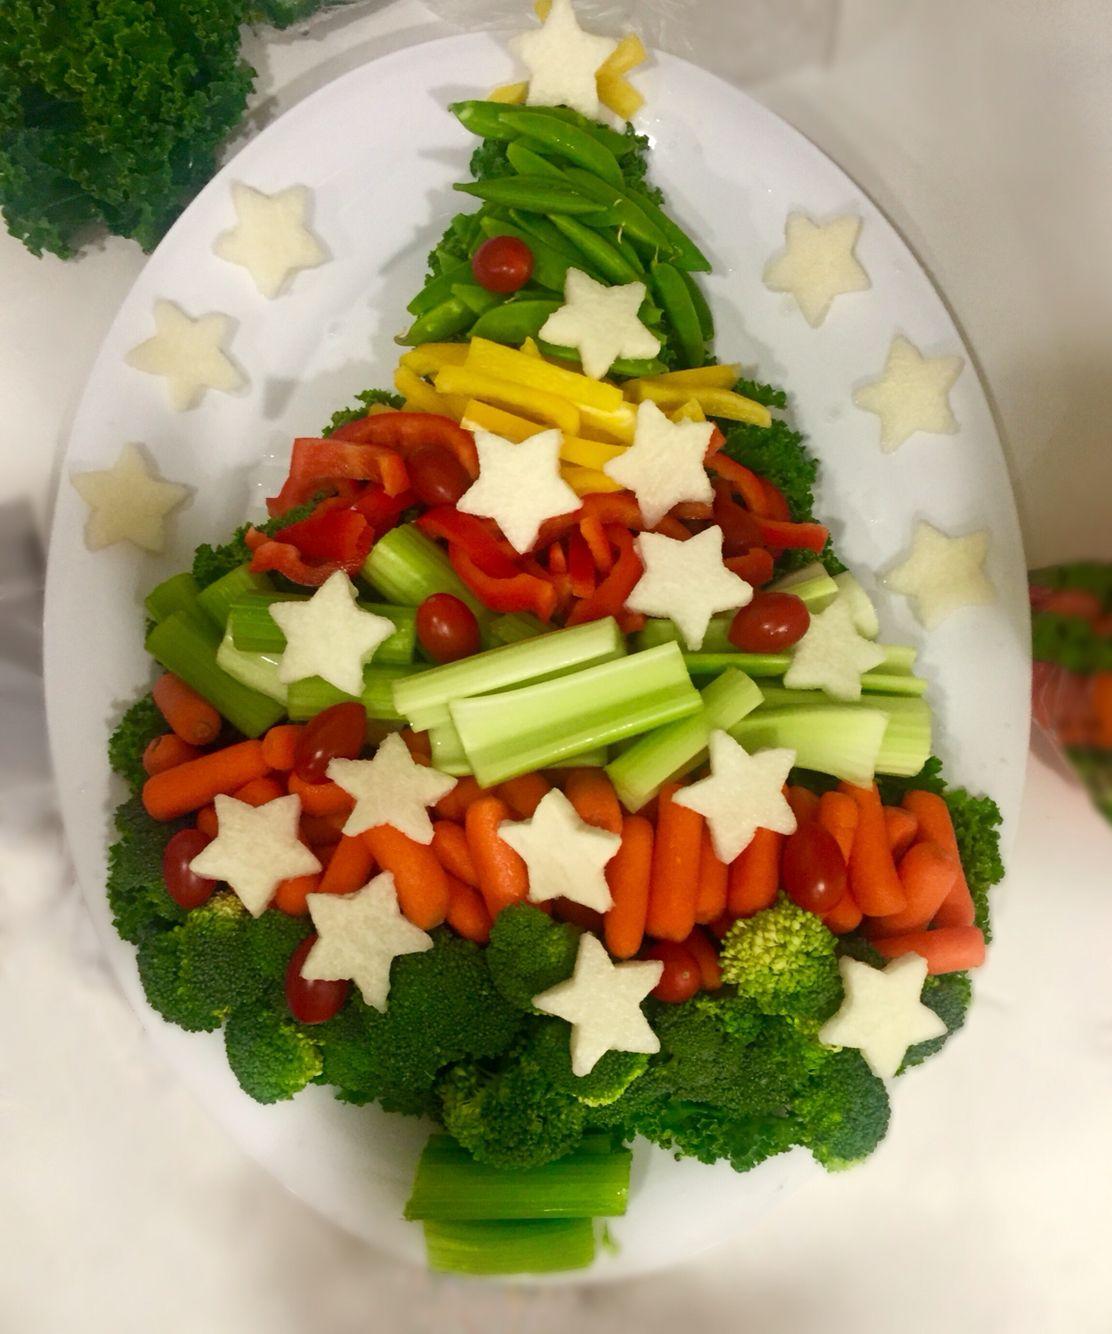 Veggie Christmas Tree Recipe: Festive Christmas Tree Veggie Tray #christmasveggies